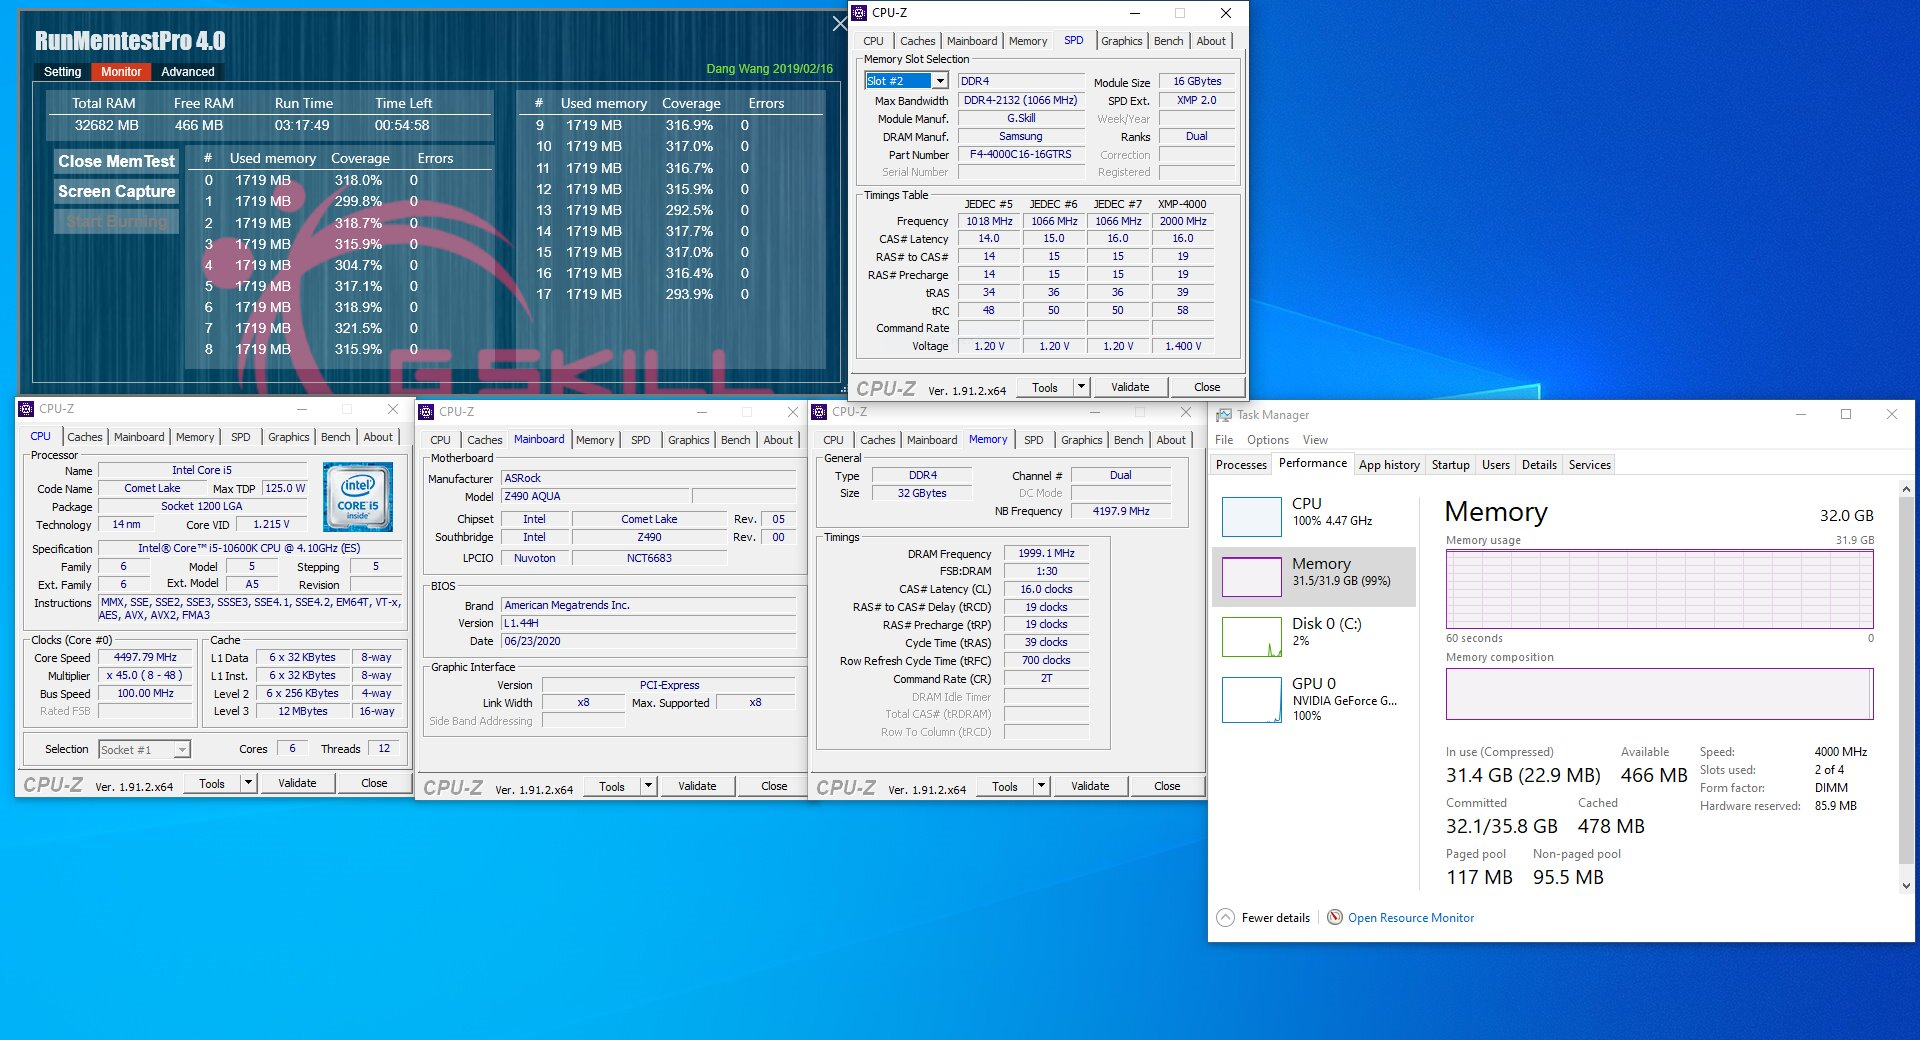 G.Skill Trident Z Royal, Trident Z RGB und Ripjaws V als 32-GB-Kit mit 4.000 MHz bei CL16 (ASRock Z490)